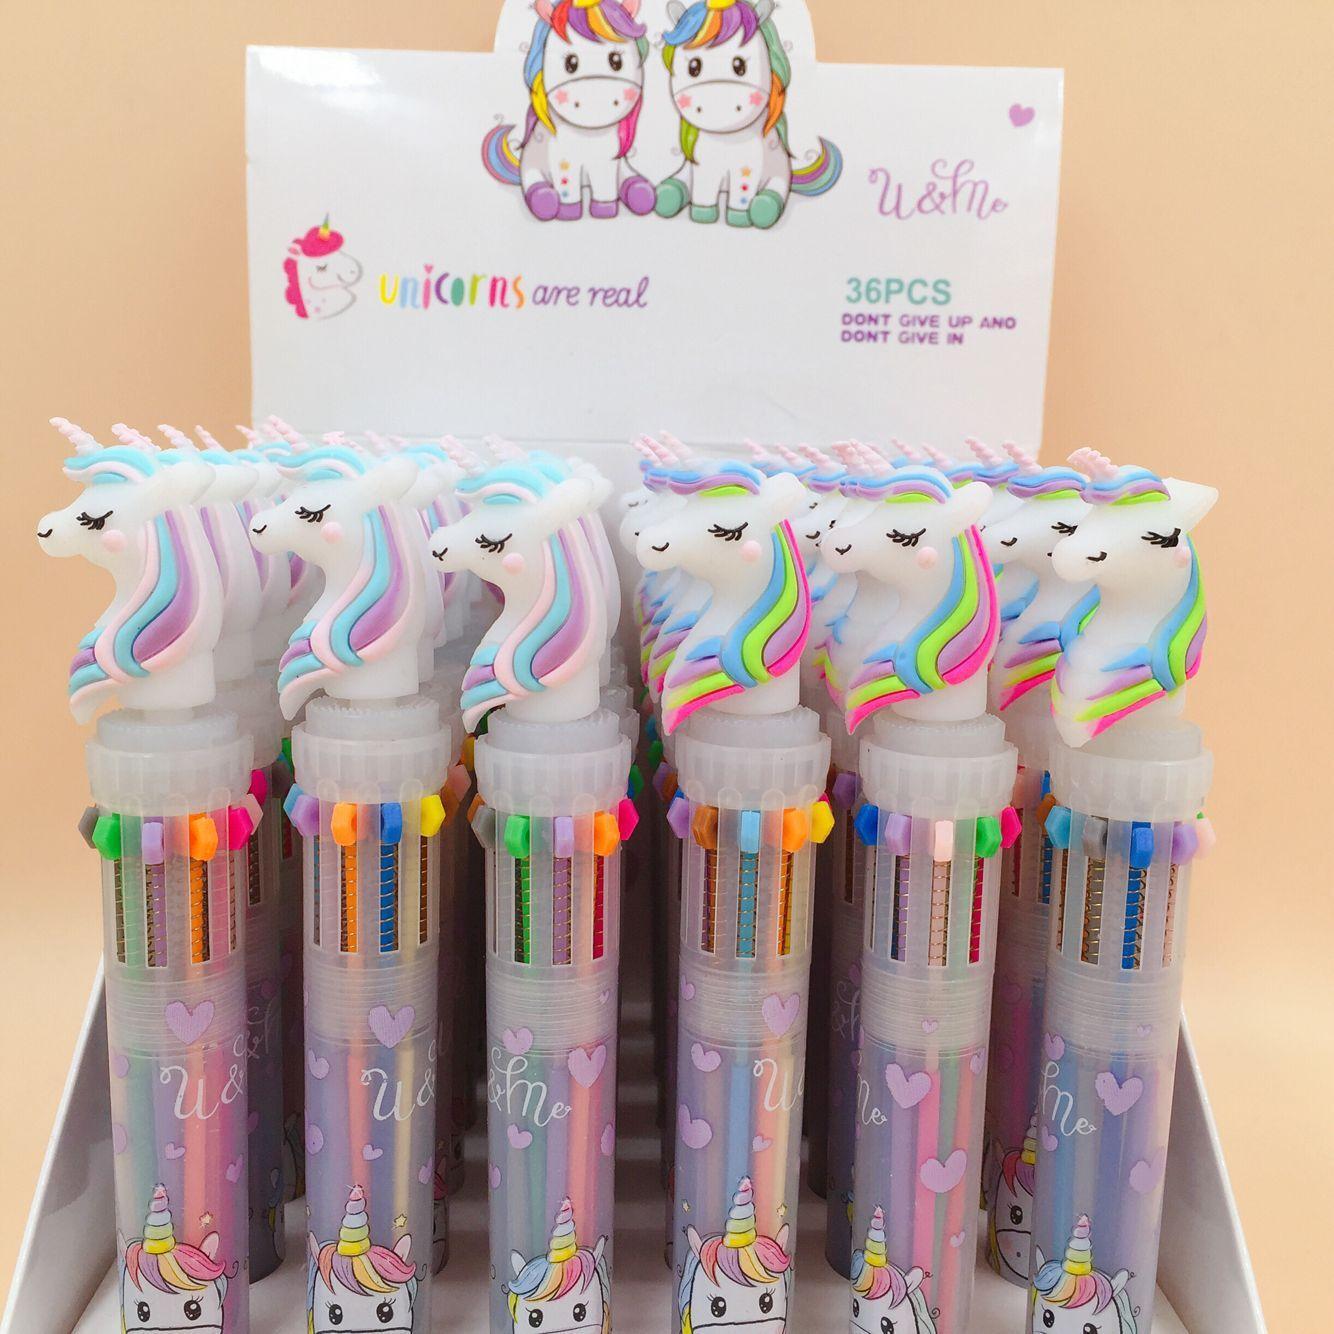 40 pcs lote rainbow unicorn 10 cores caneta esferografica imprensa bonito canetas esferograficas escola escritorio escrita